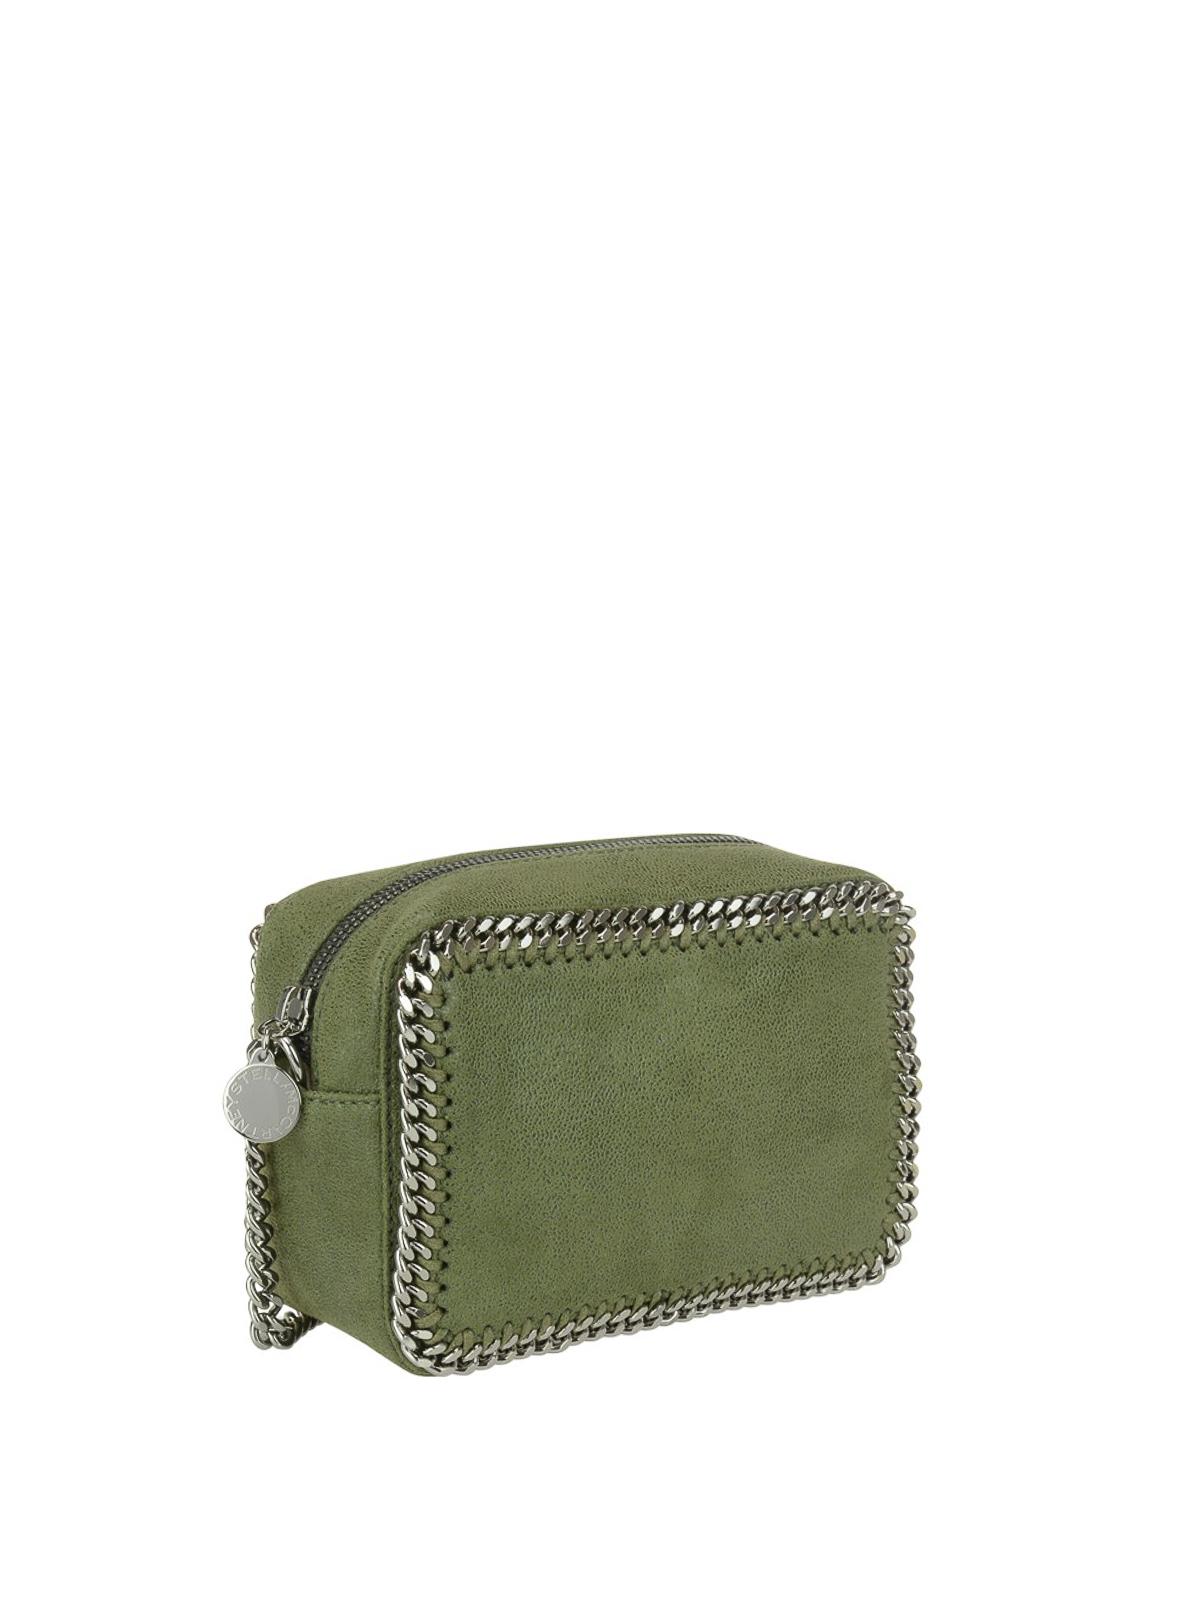 2e83c7d5aa STELLA McCARTNEY  cross body bags online - Falabella olive green crossbody  bag